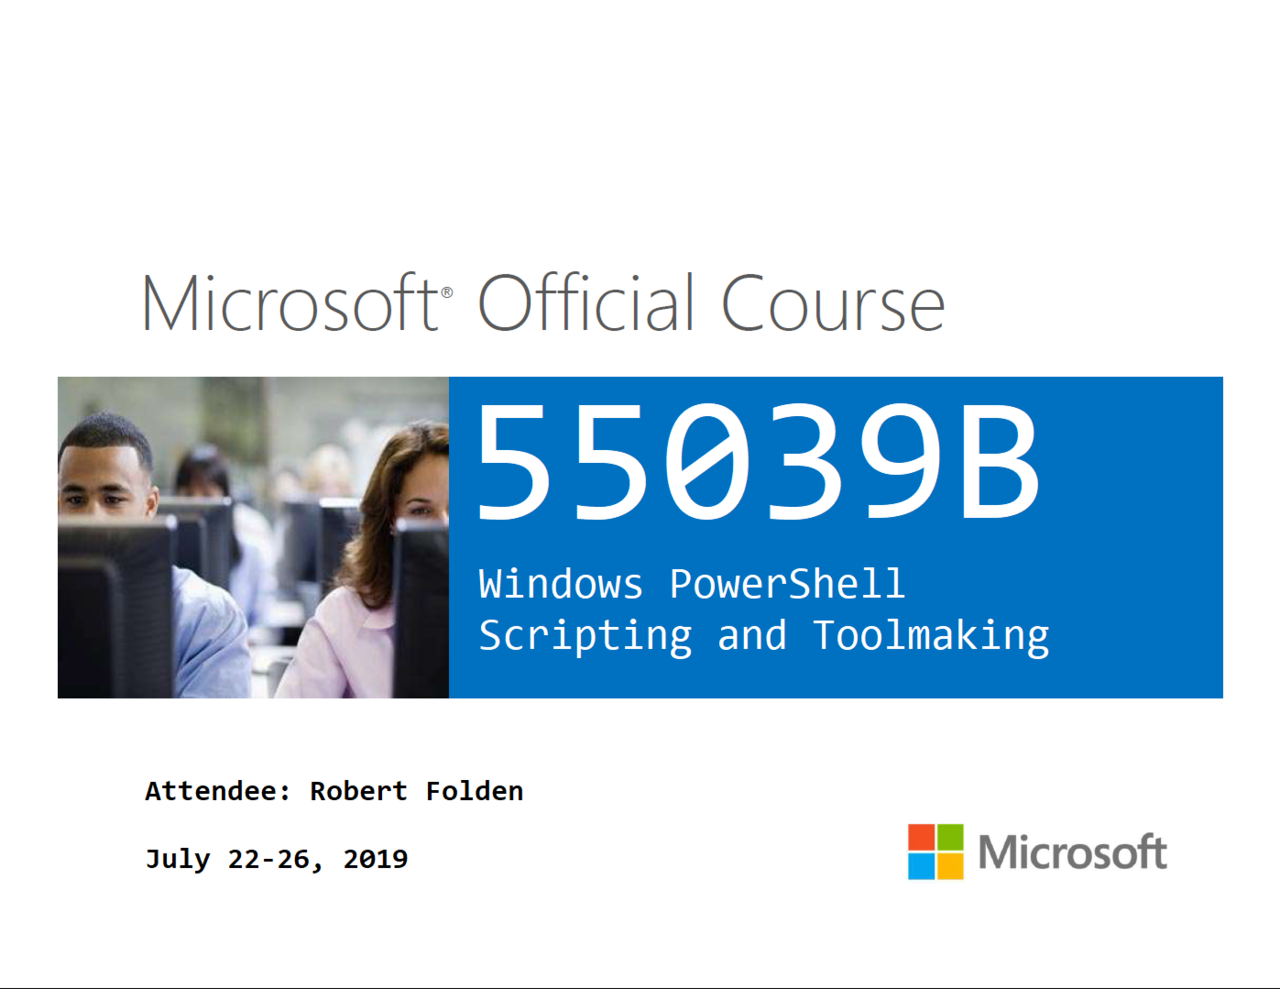 55039B Windows PowerShell Scripting And Toolmaking